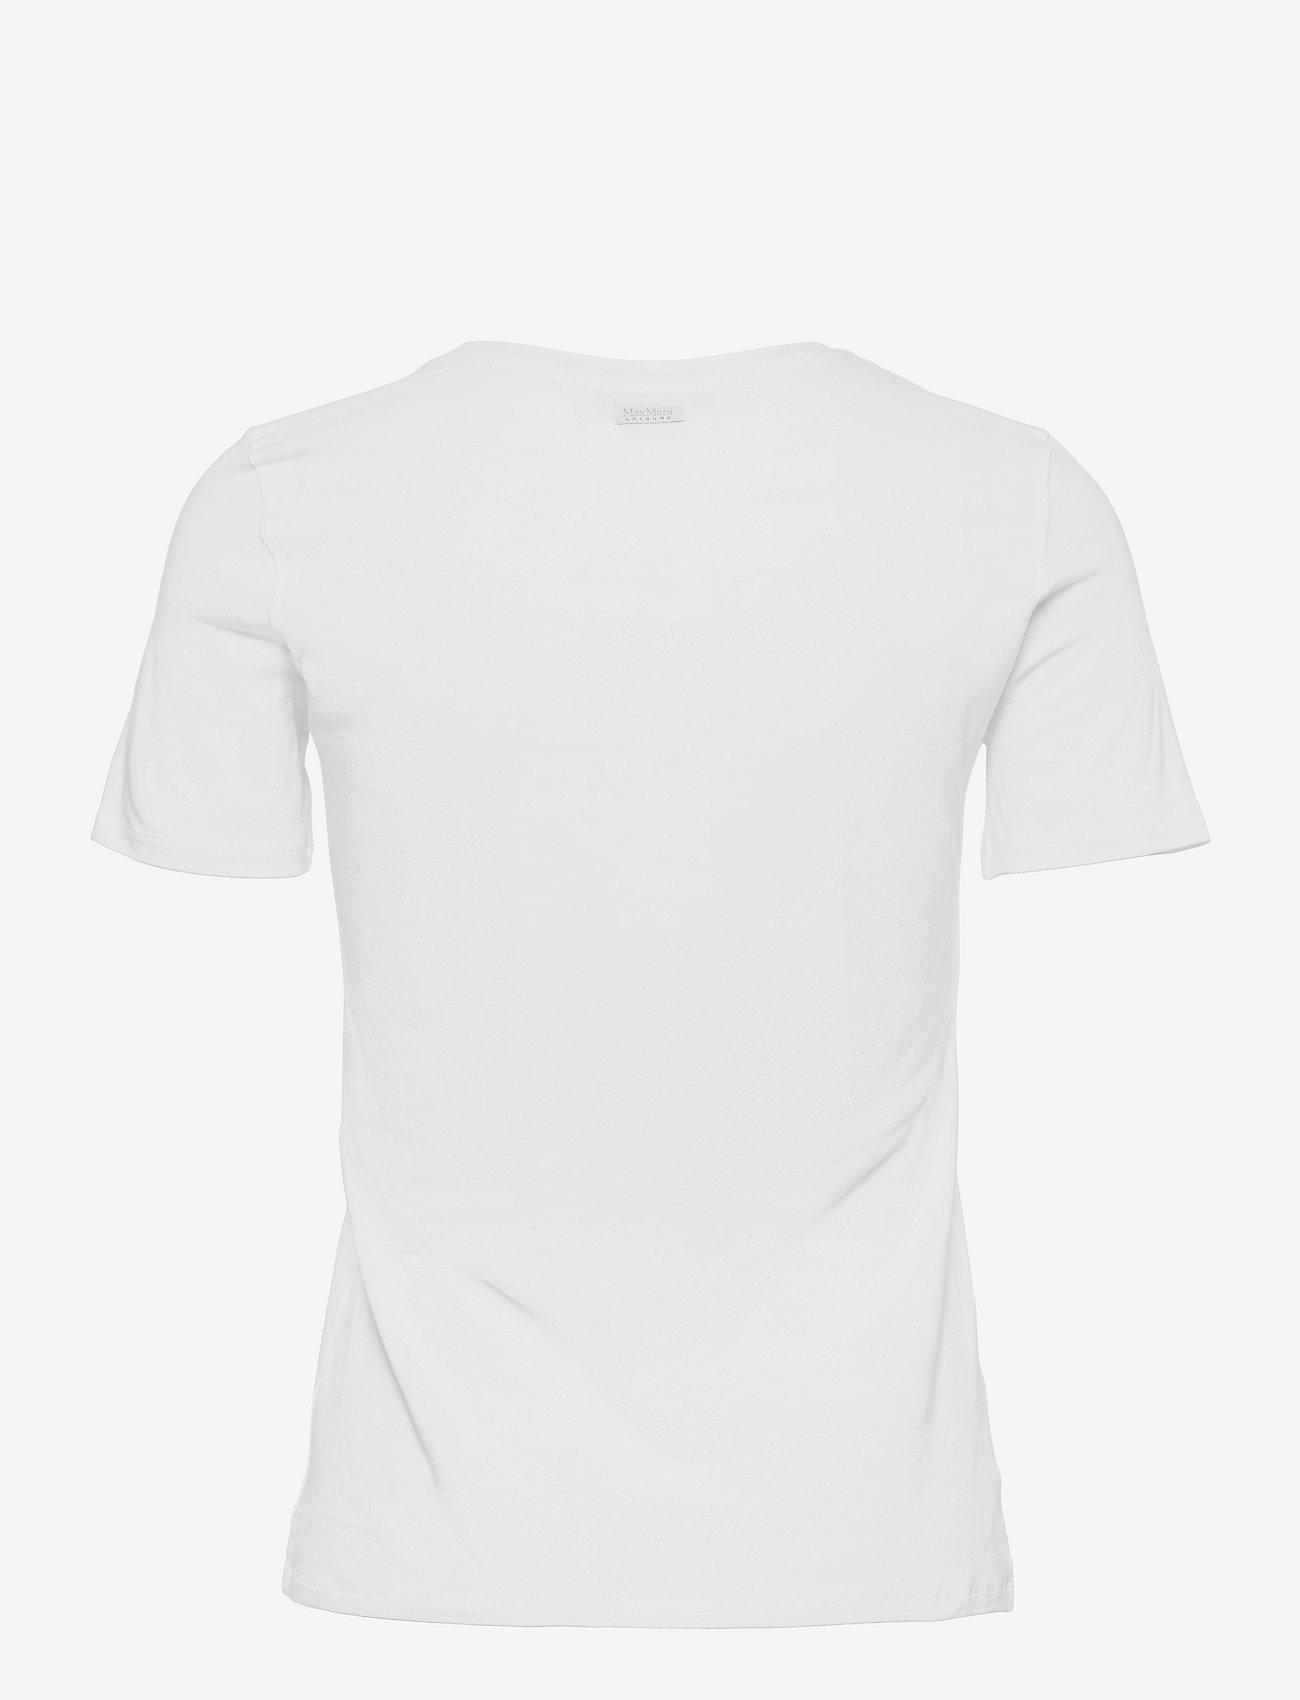 Max Mara Leisure - VAGARE - t-shirts - white - 1